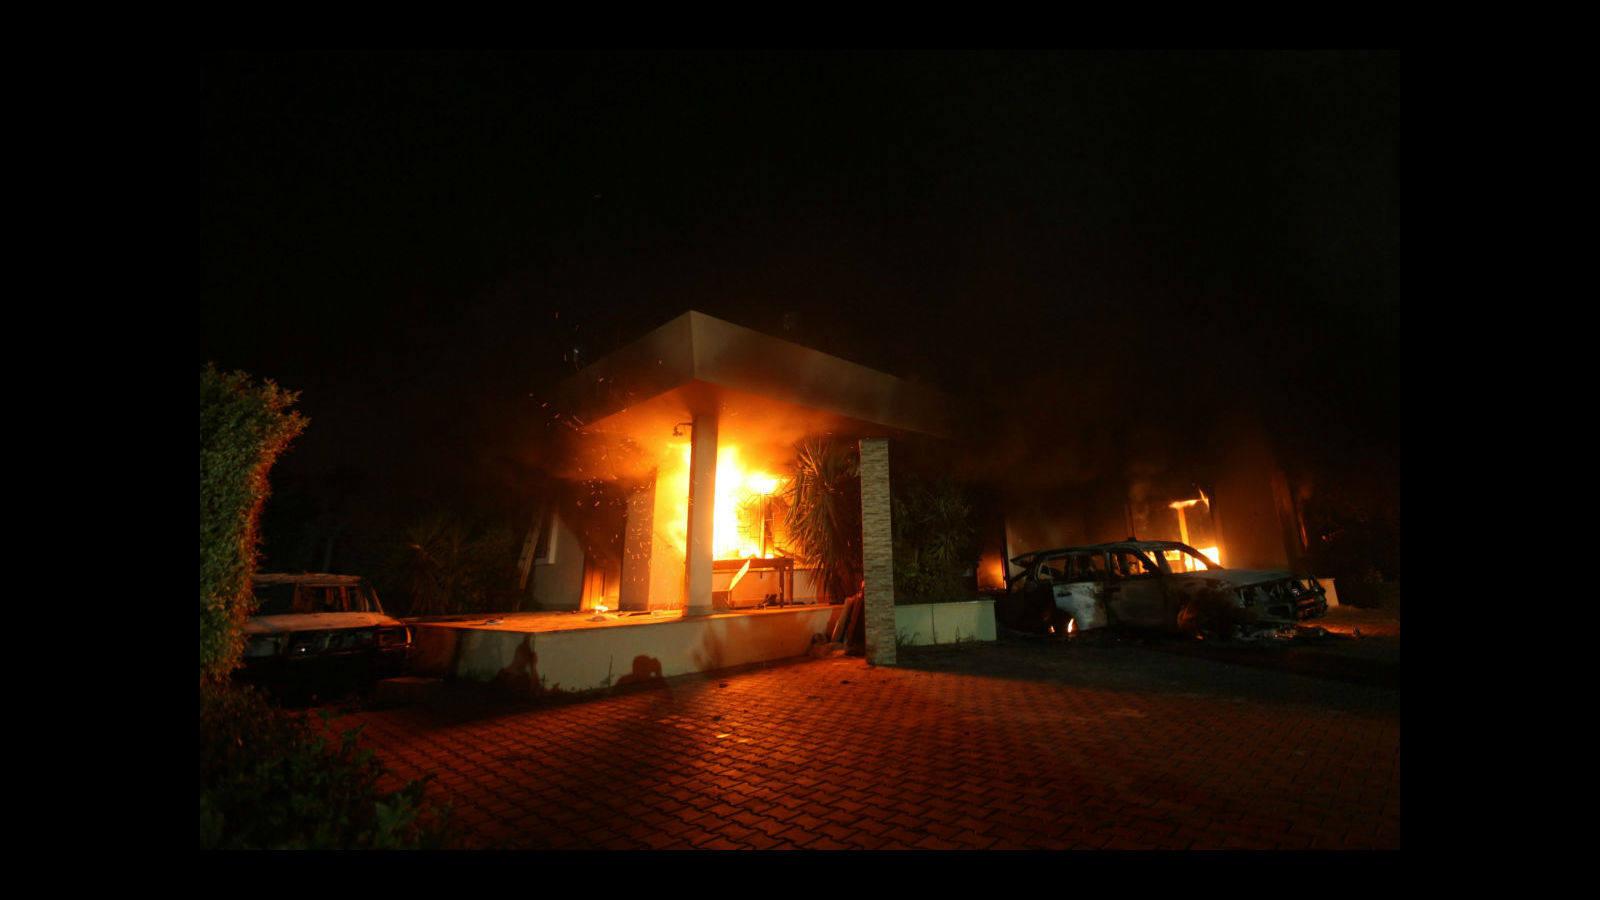 Resultado de imagen para Asalto al consulado estadounidense en Bengasi